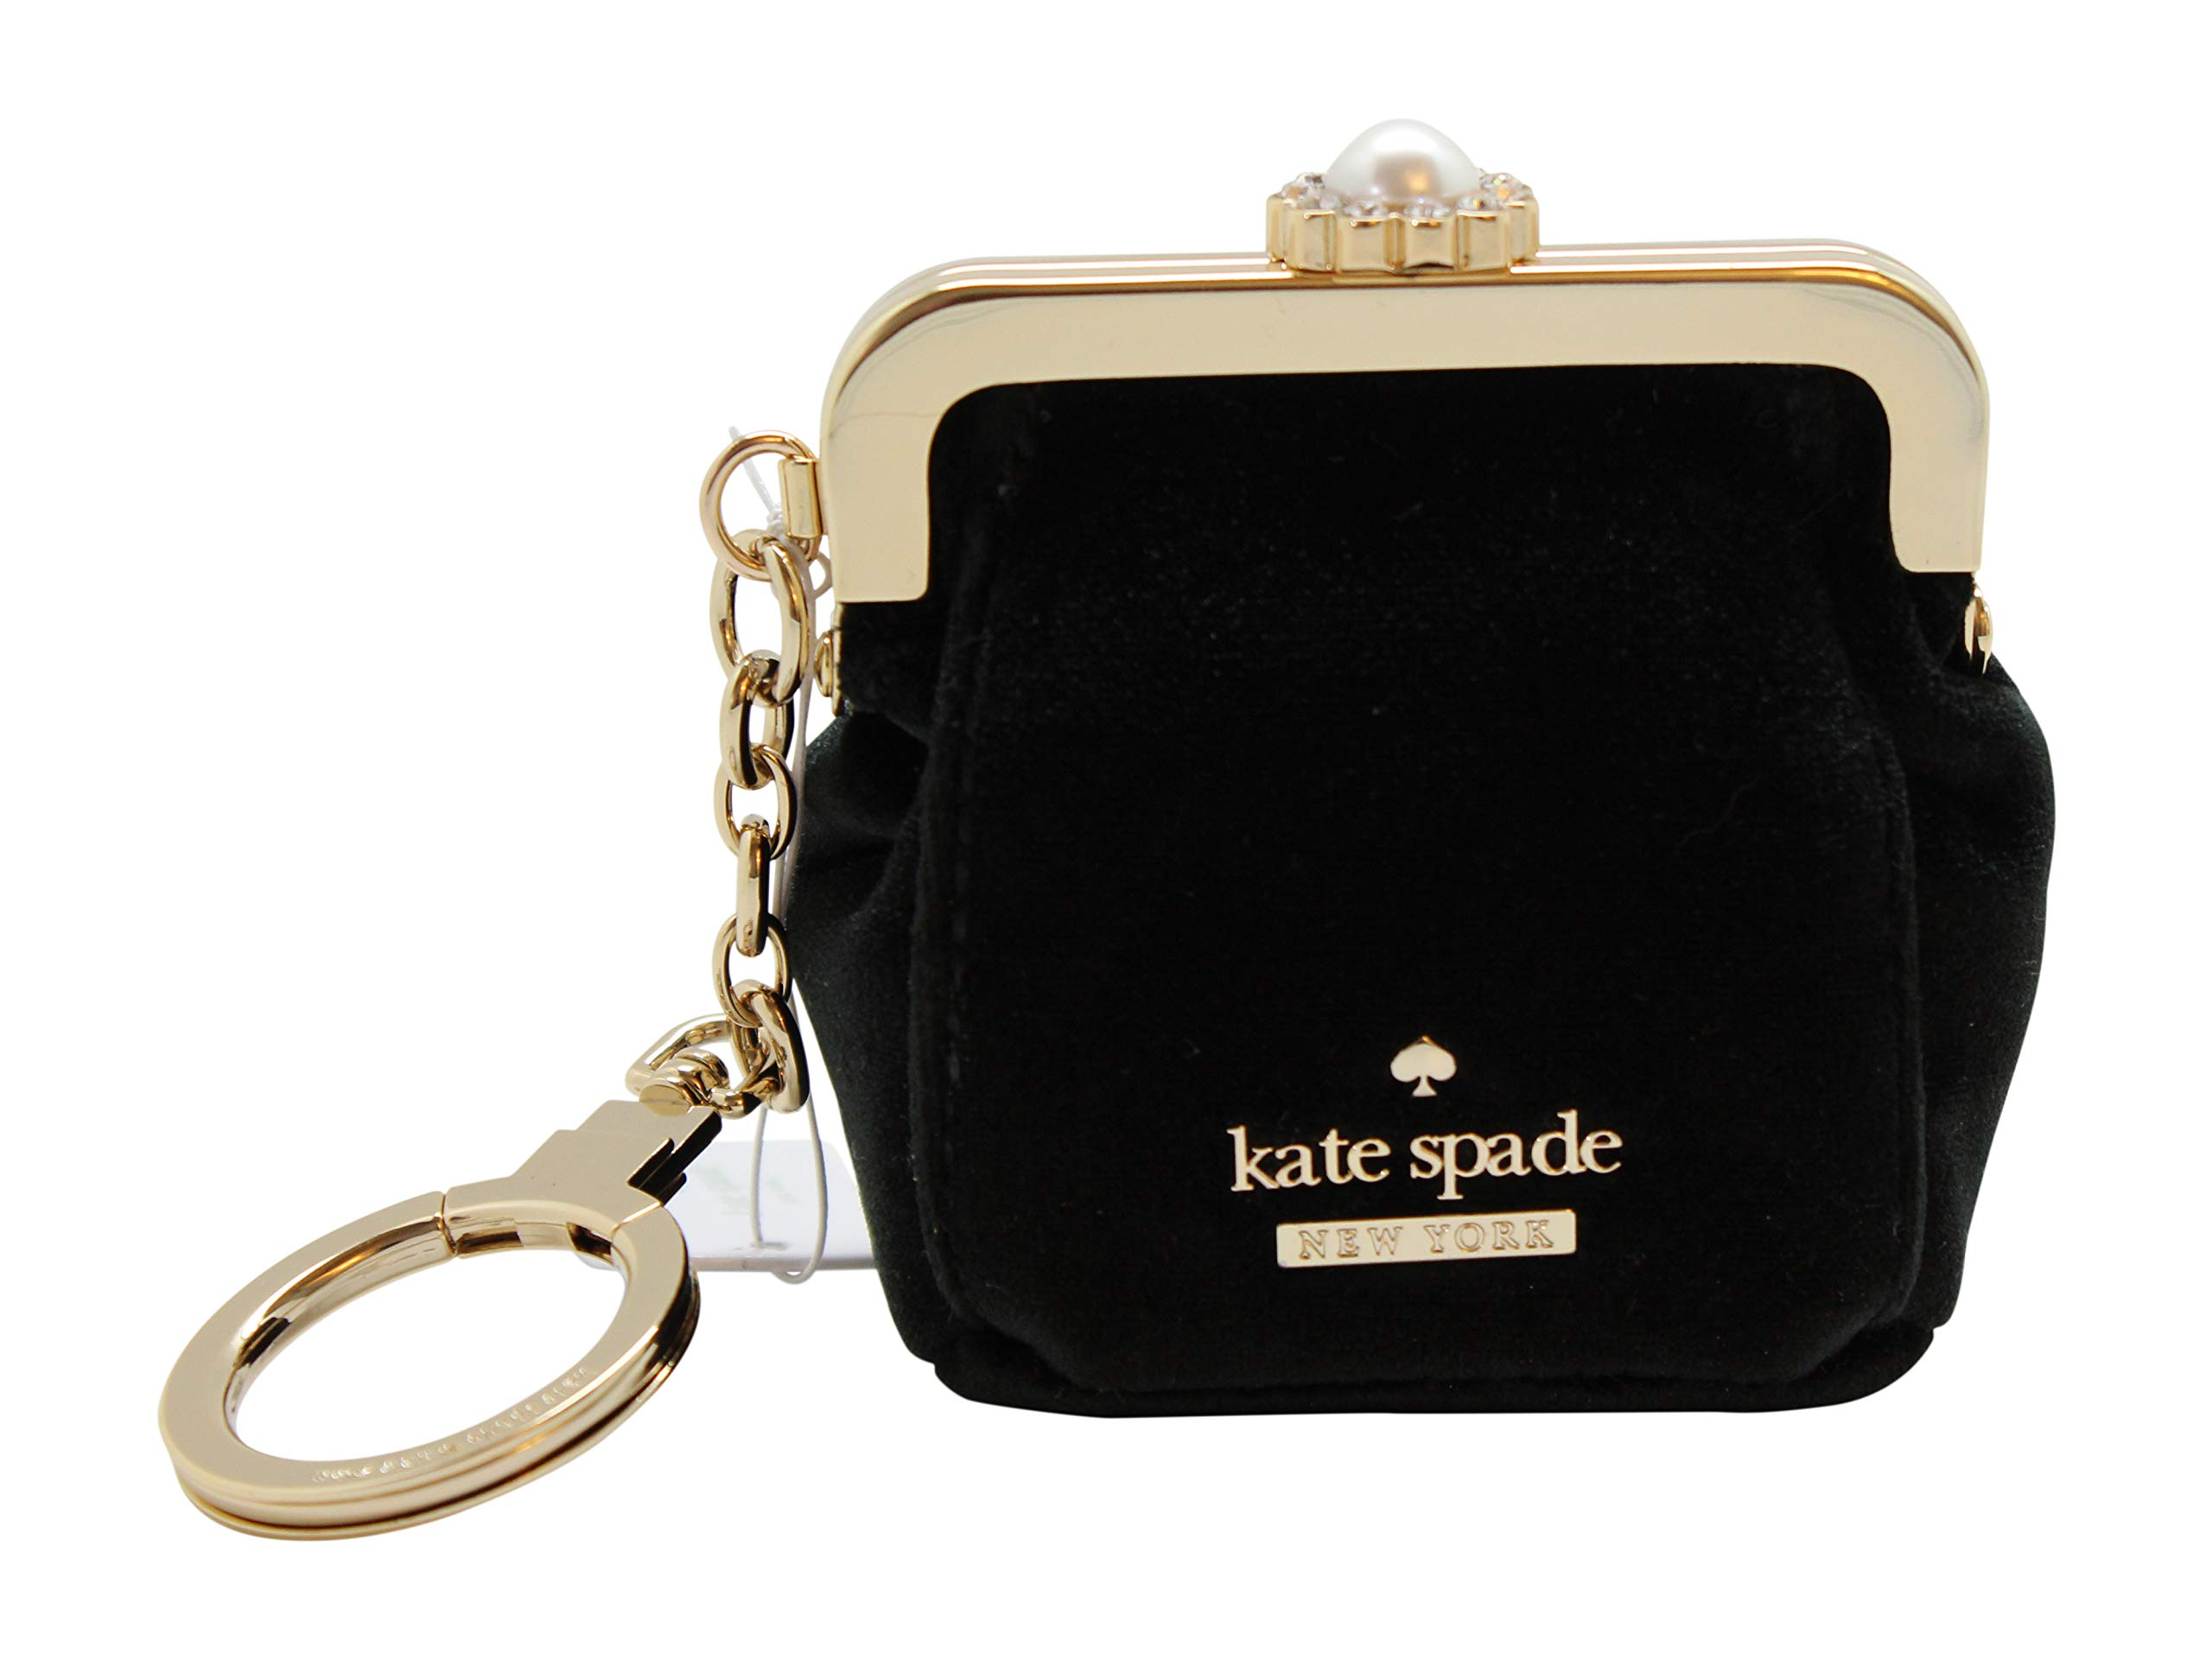 Kate Spade Little Black Velvet Coin Purse Small Keychain